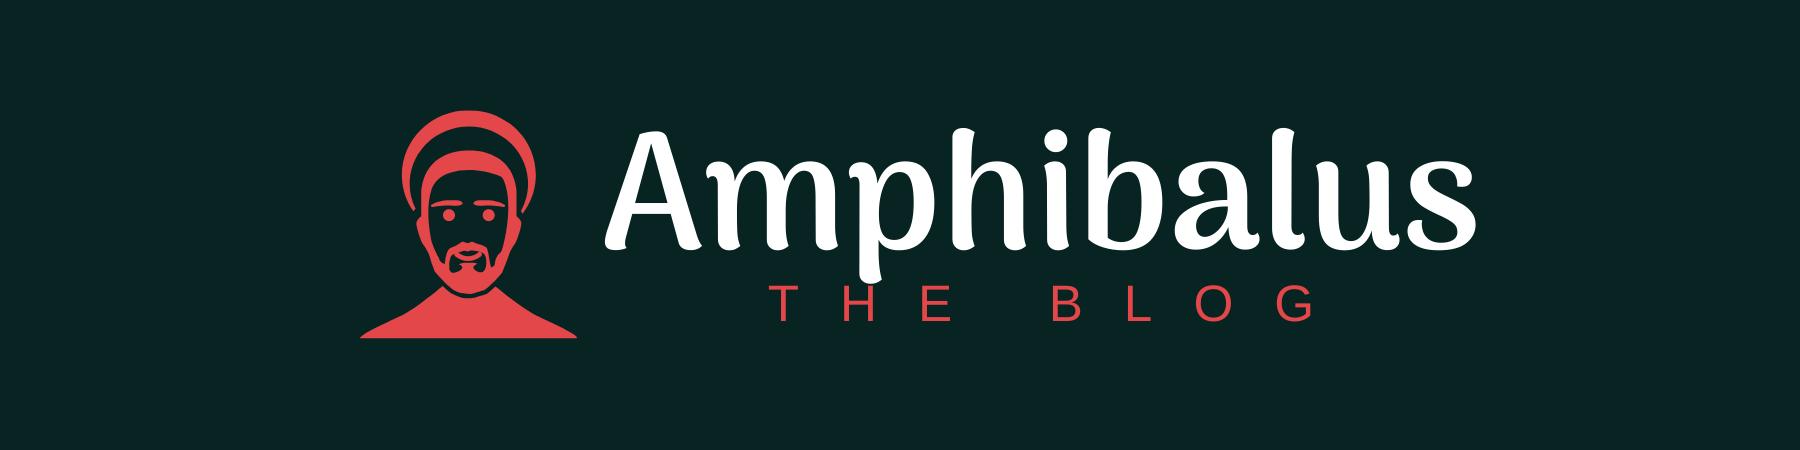 Amphibalus